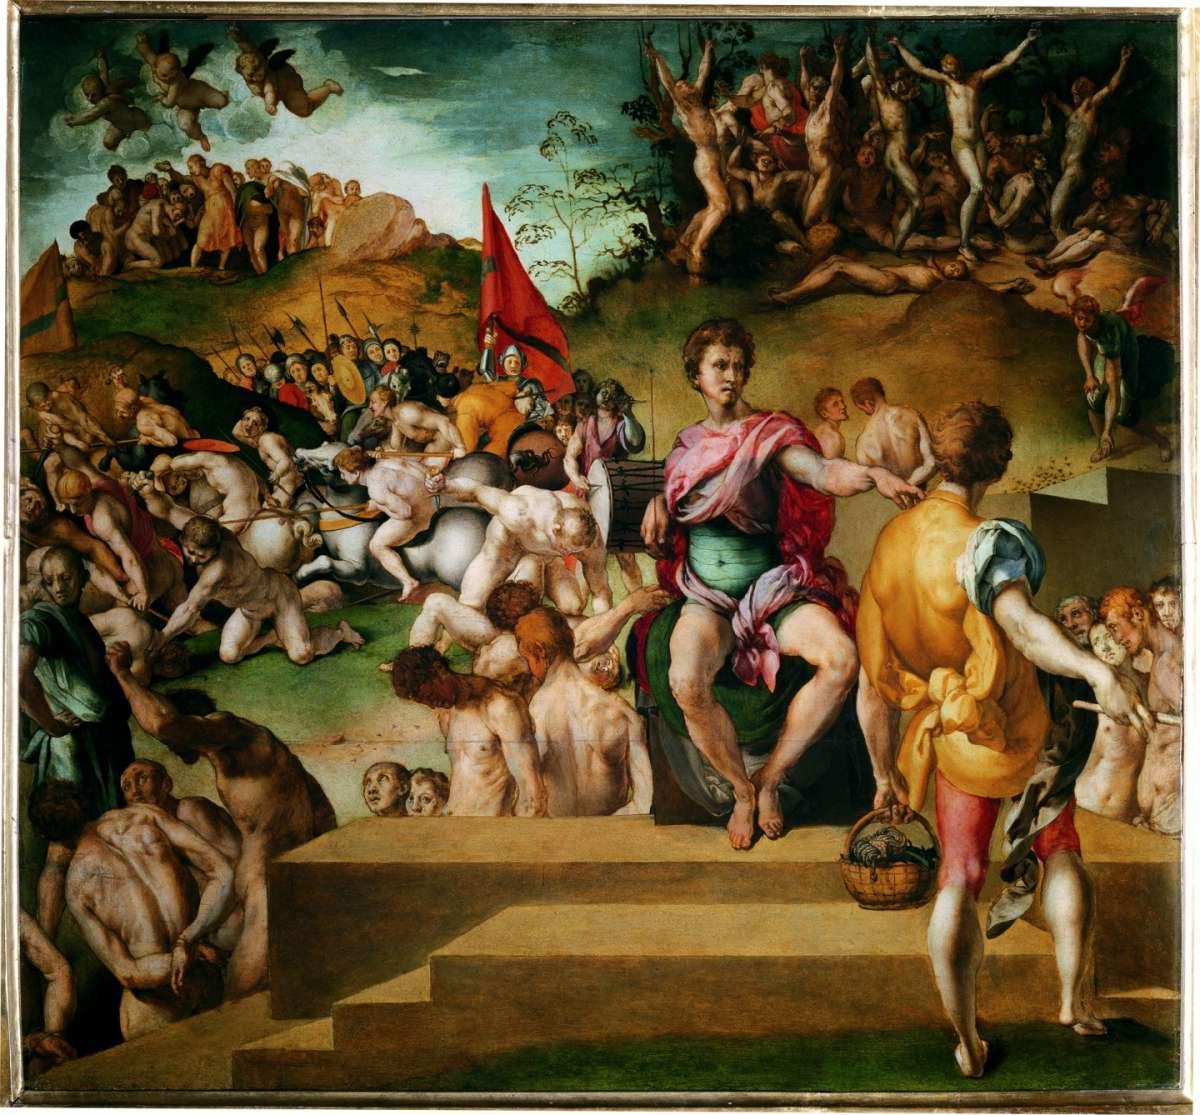 A Firenze la splendida mostra su Pontormo e Rosso Fiorentino